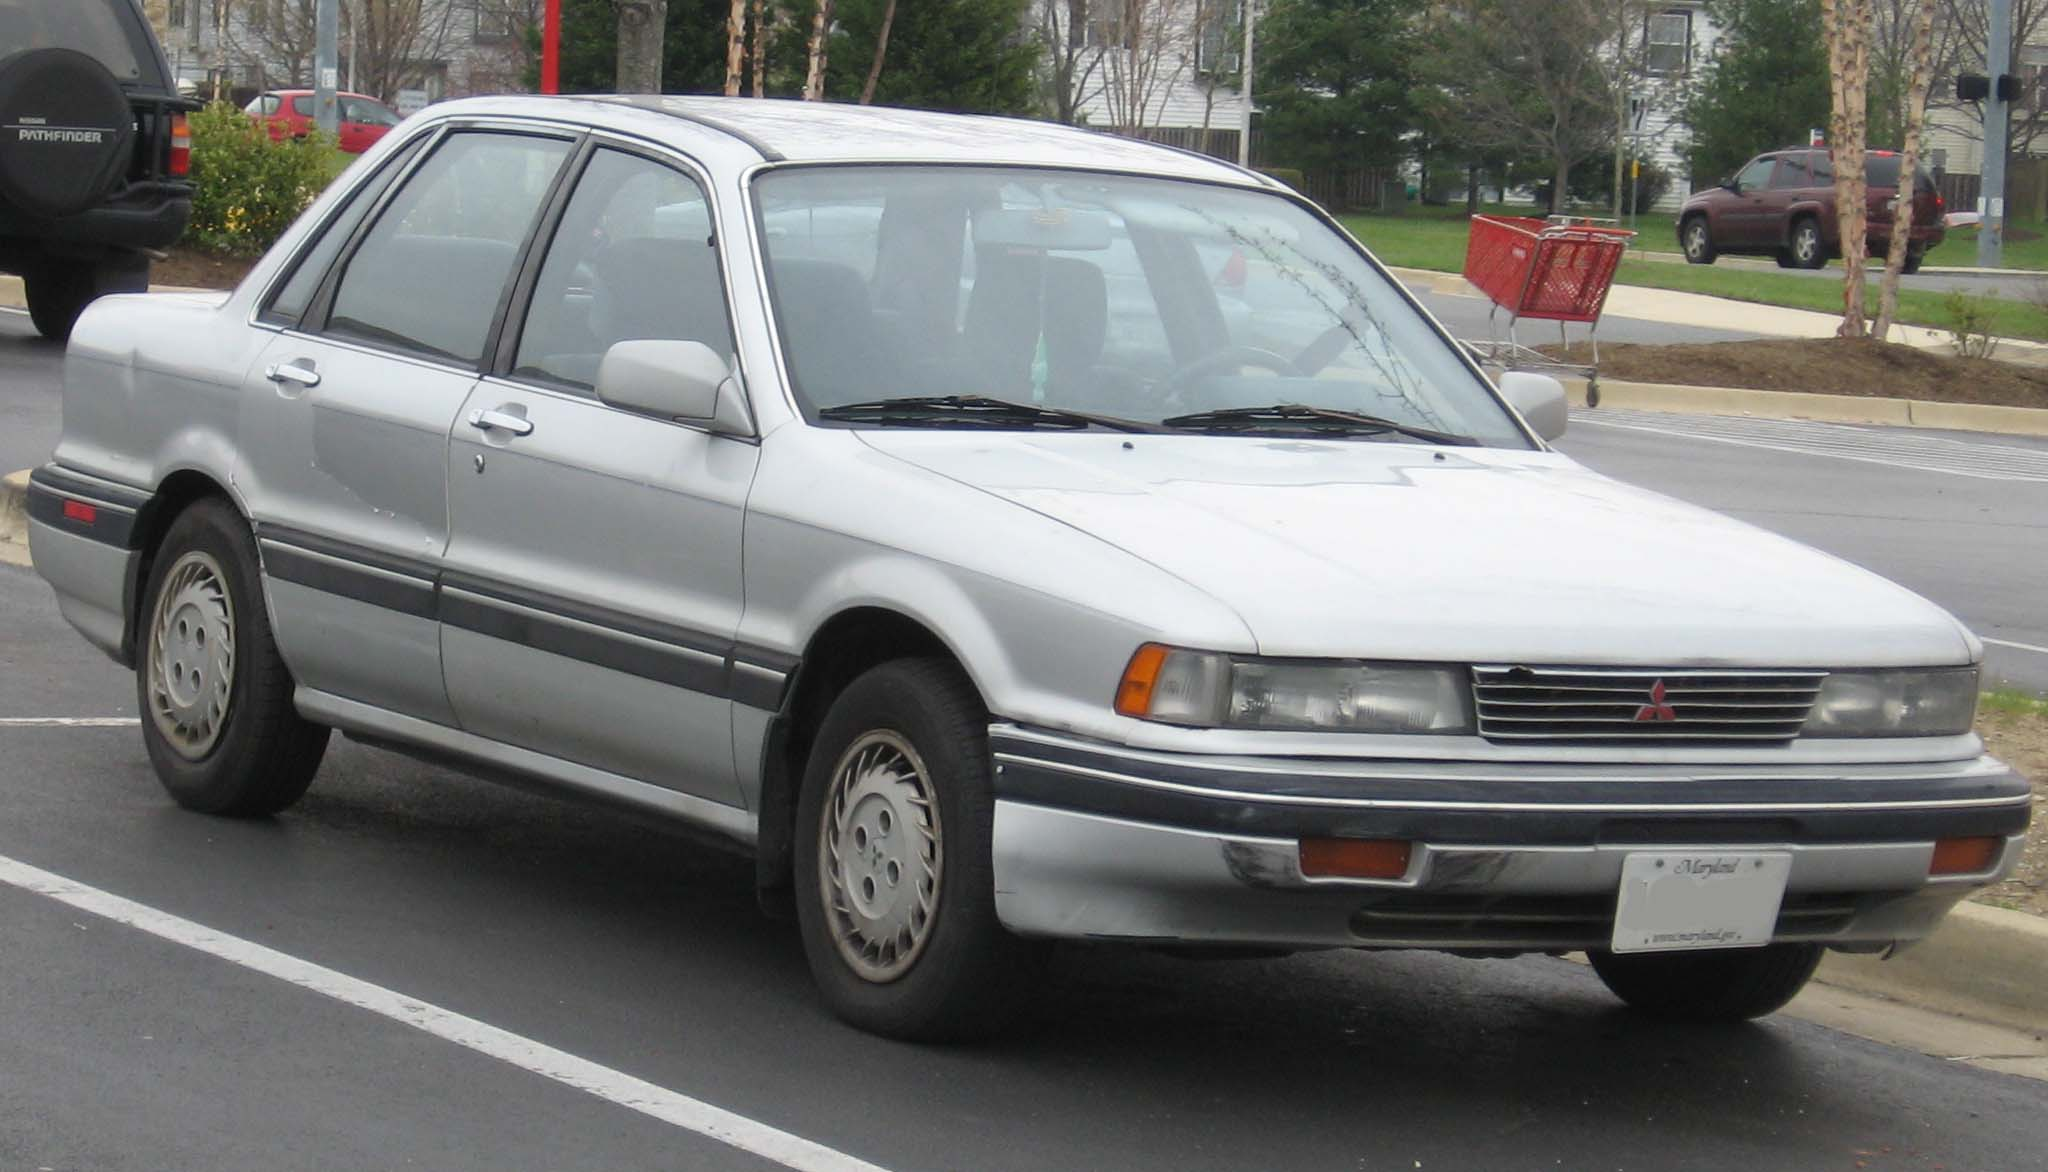 mitsubishi galant vi 1987 1992 sedan outstanding cars rh carsot com Mitsubishi Galant Manual Transmission Interior Mitsubishi Galant Transmission Standard